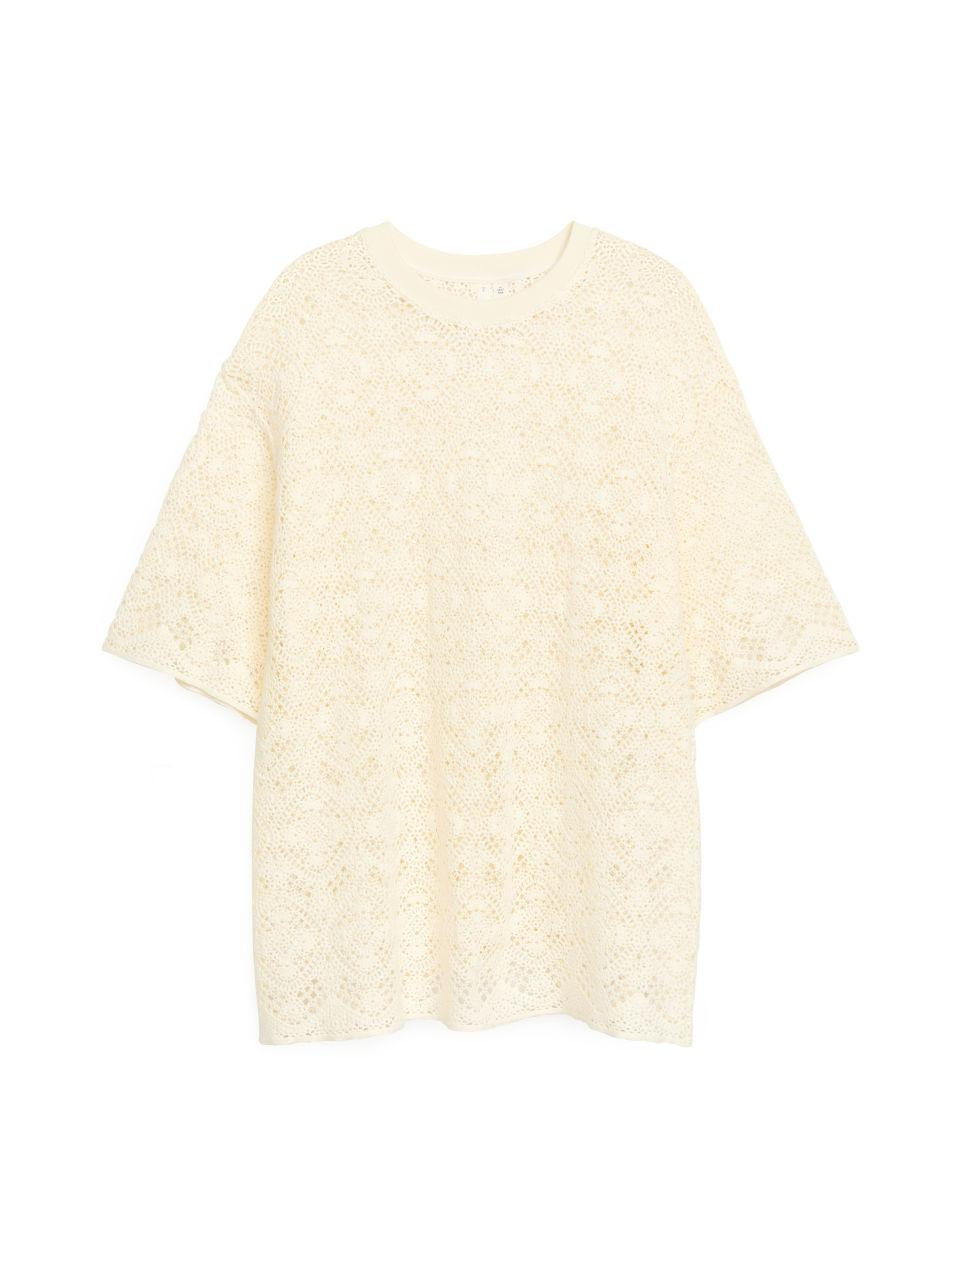 Crochet T-Shirt - White